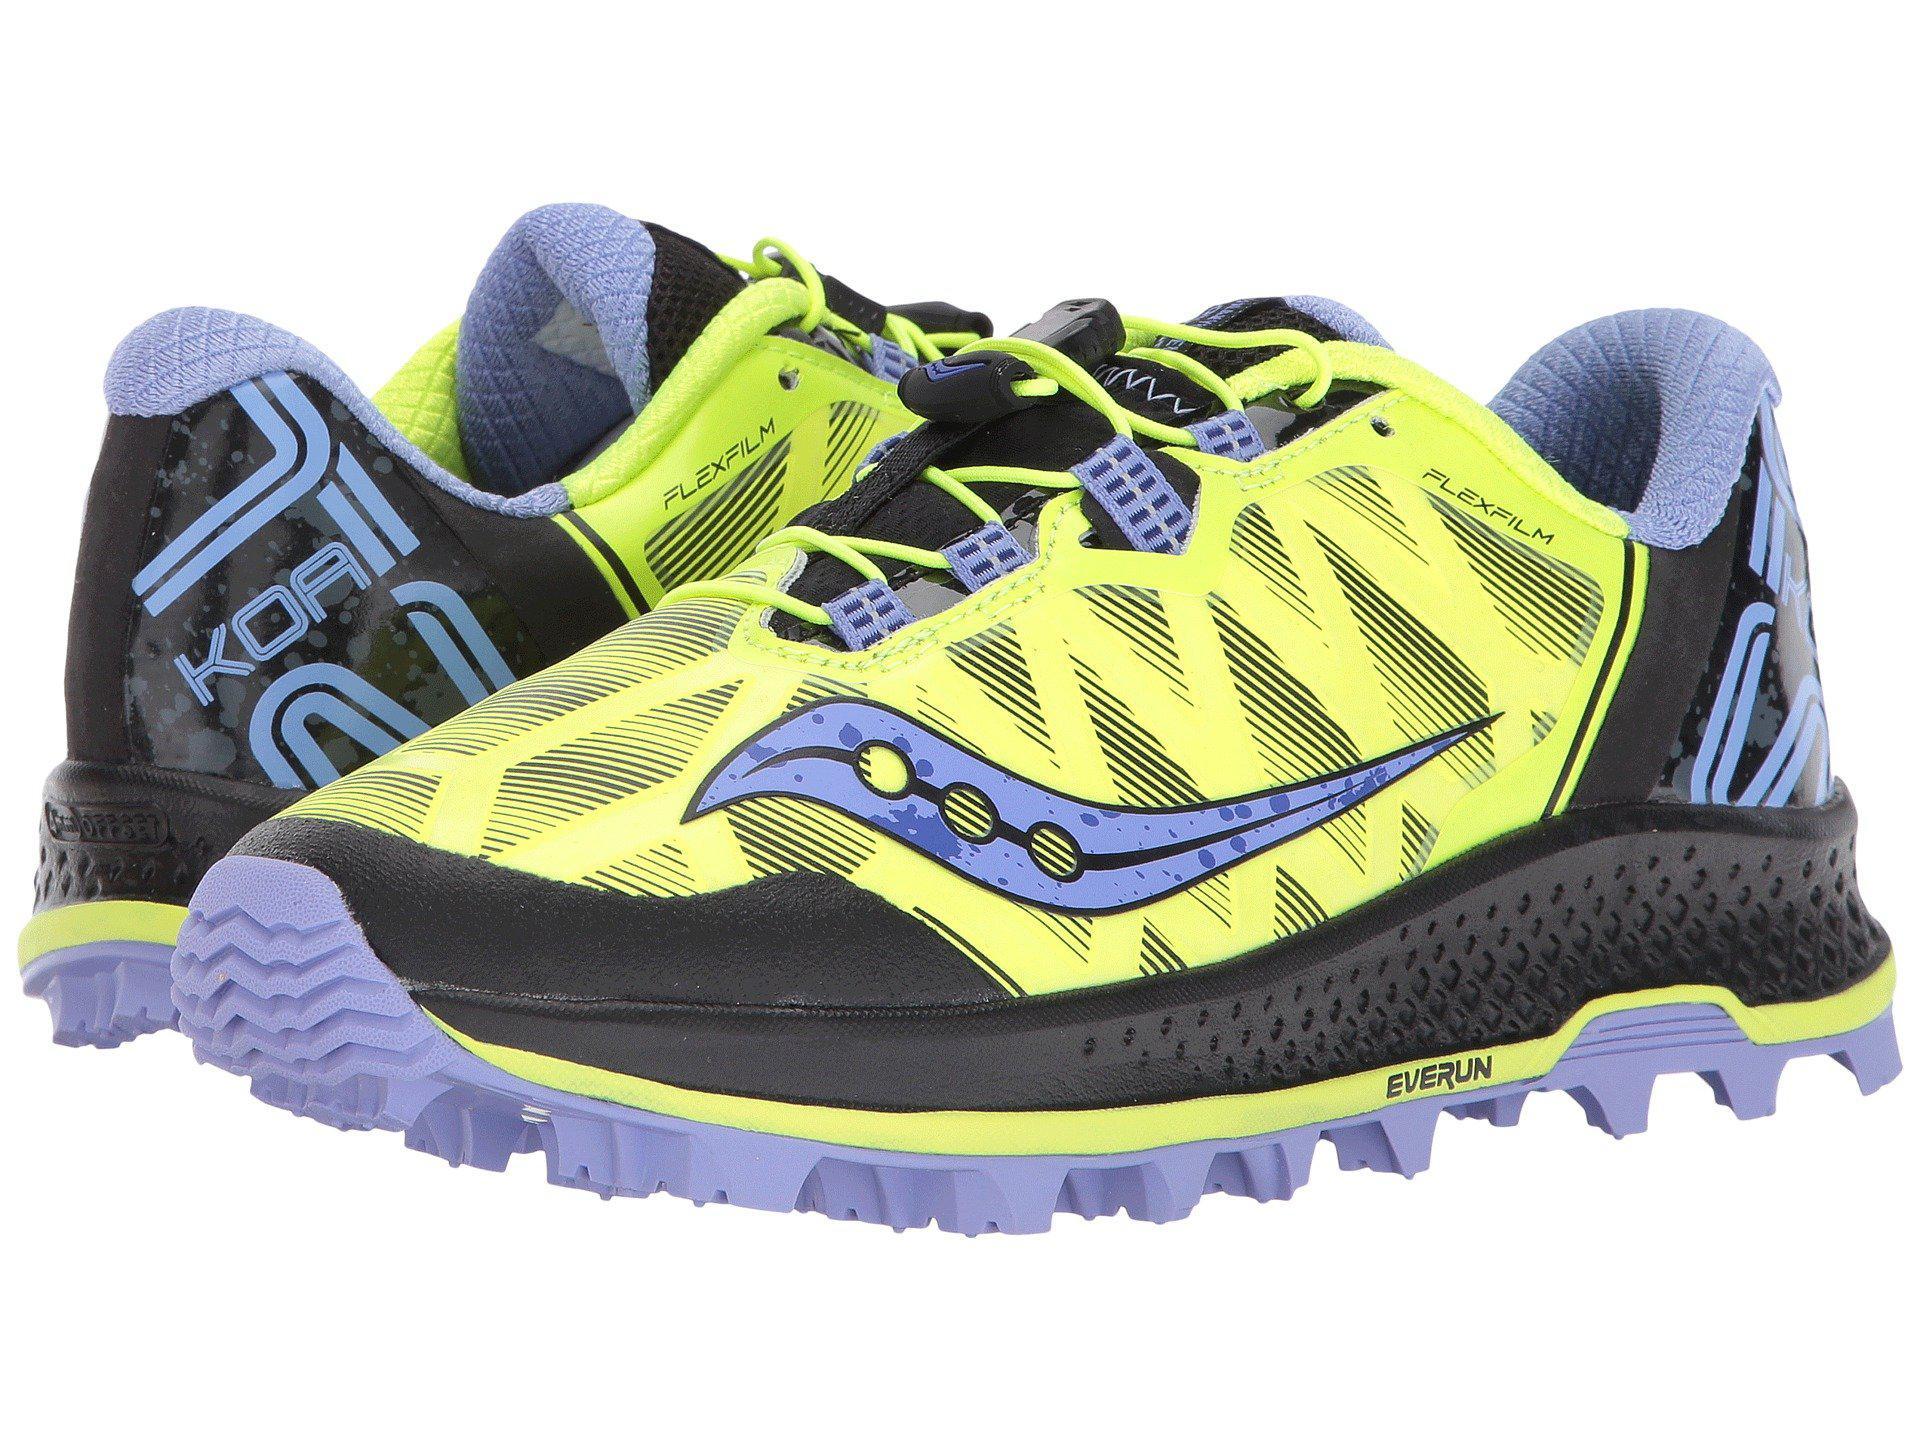 66f0f8261ca9 Lyst - Saucony Koa St (citron purple) Women s Running Shoes